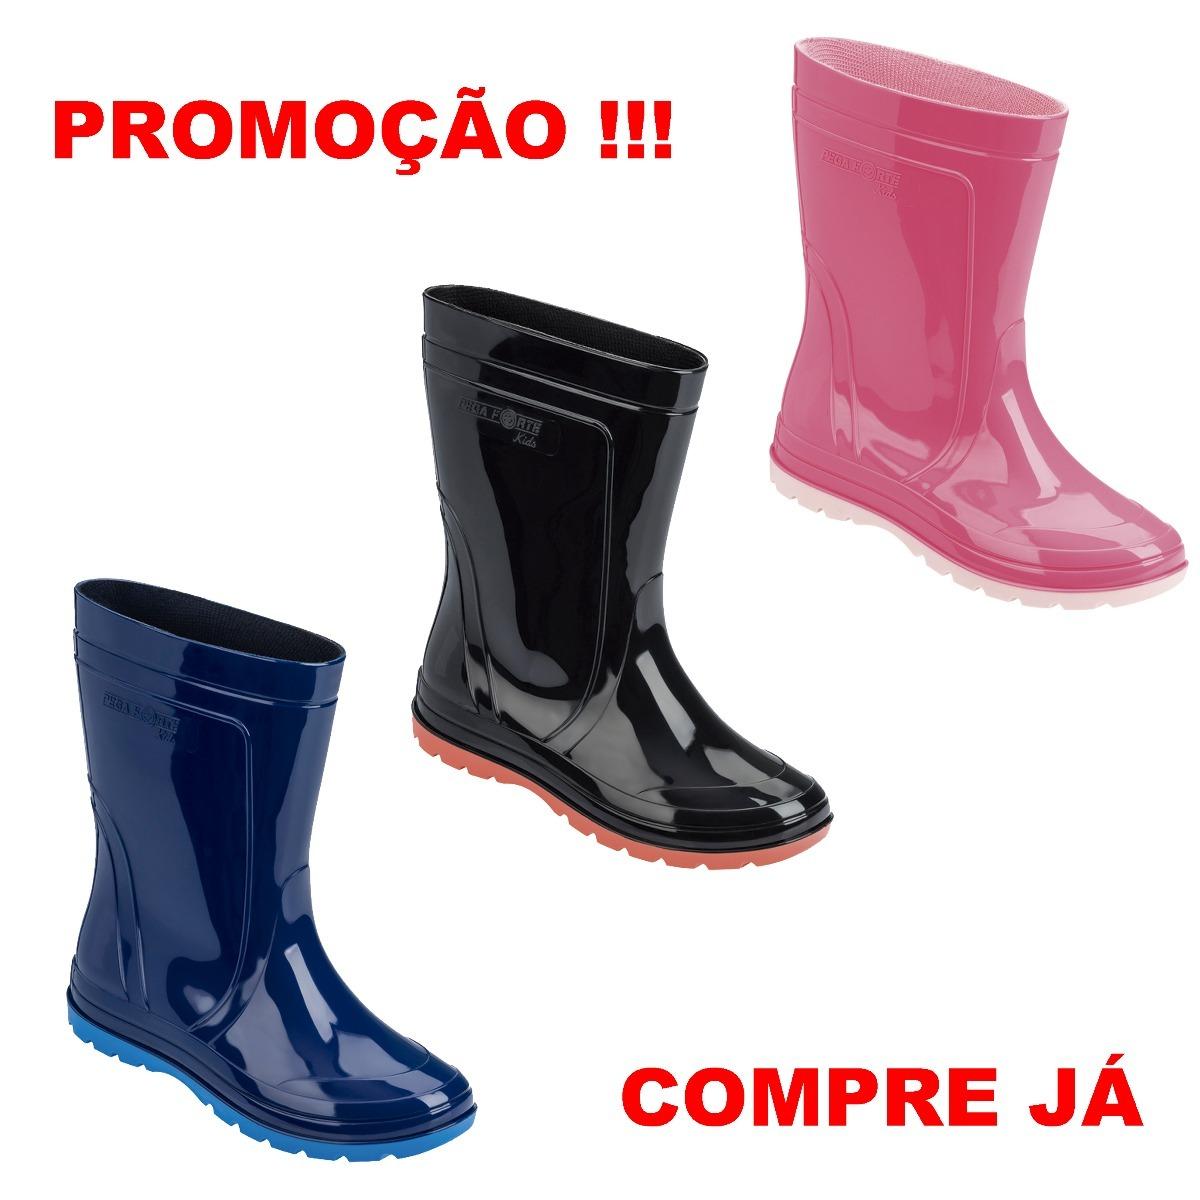 301c3206ae4 Bota Galocha Infantil Azul Impermeável Pvc Borracha Criança - R  38 ...